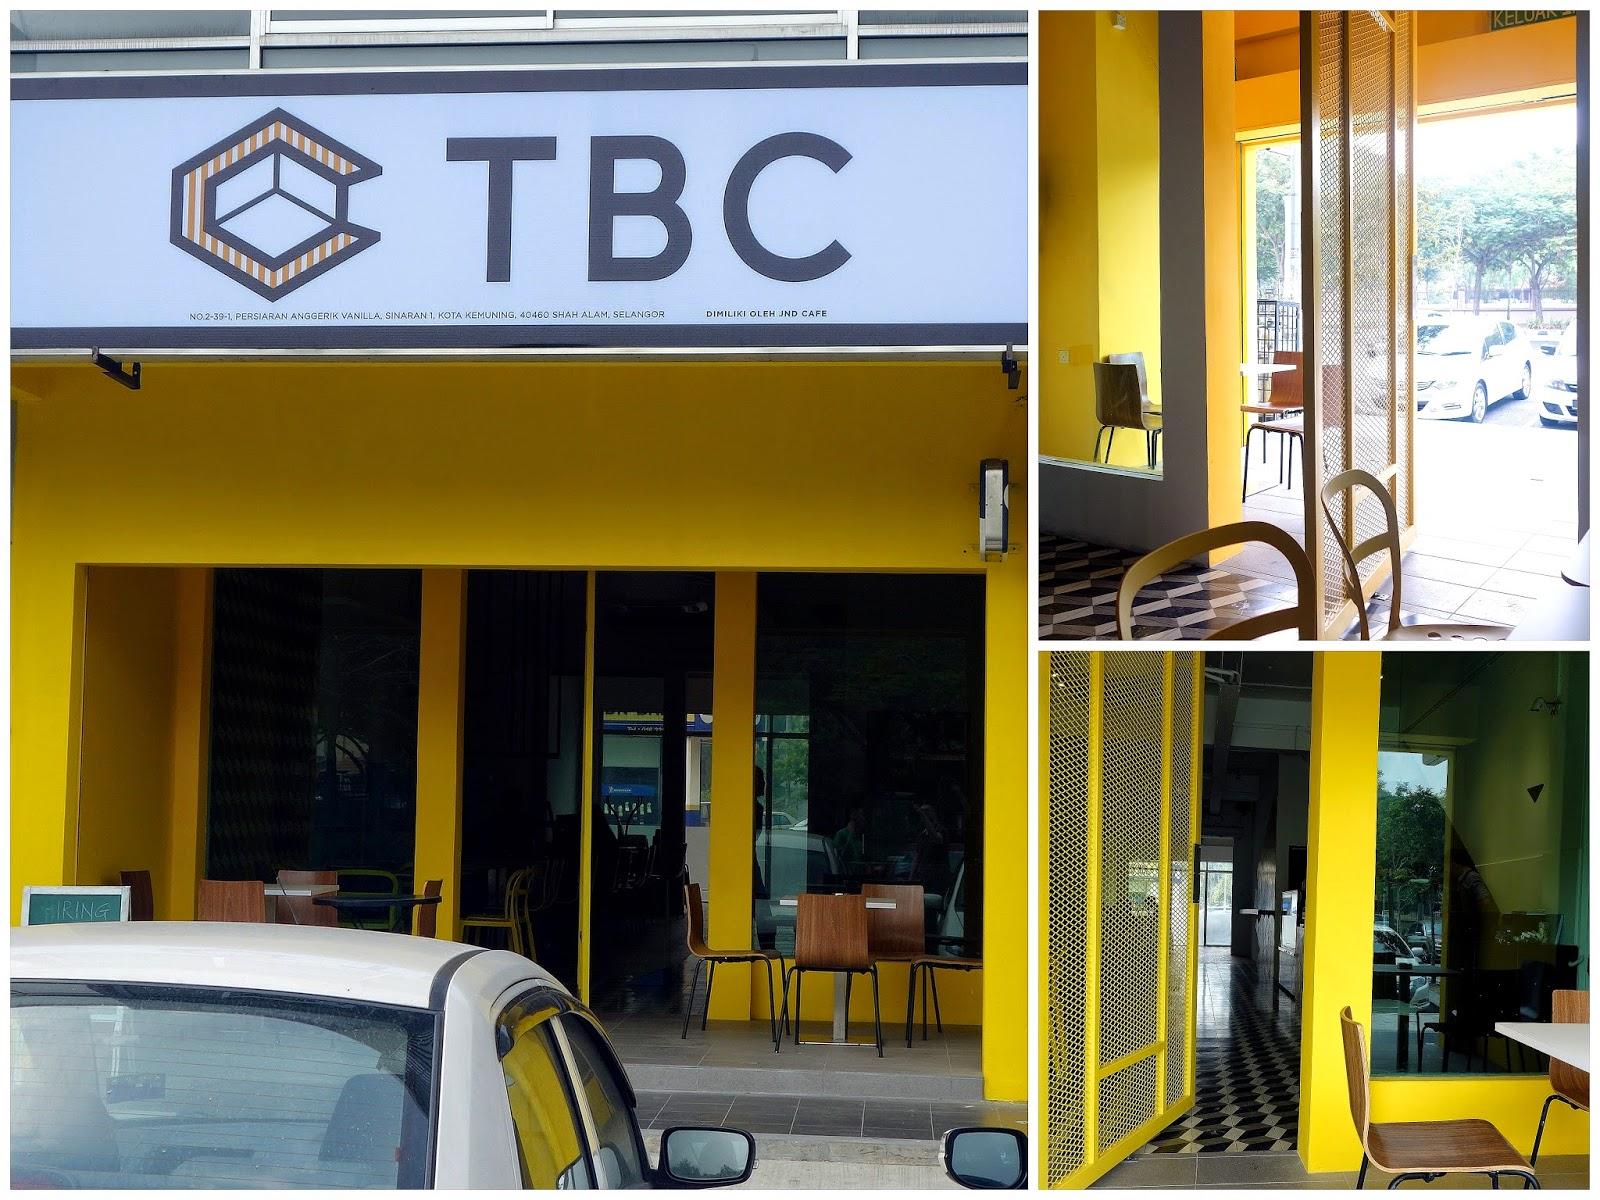 tbc cafe & le rozell french creperie @ kota kemuning, shah alam